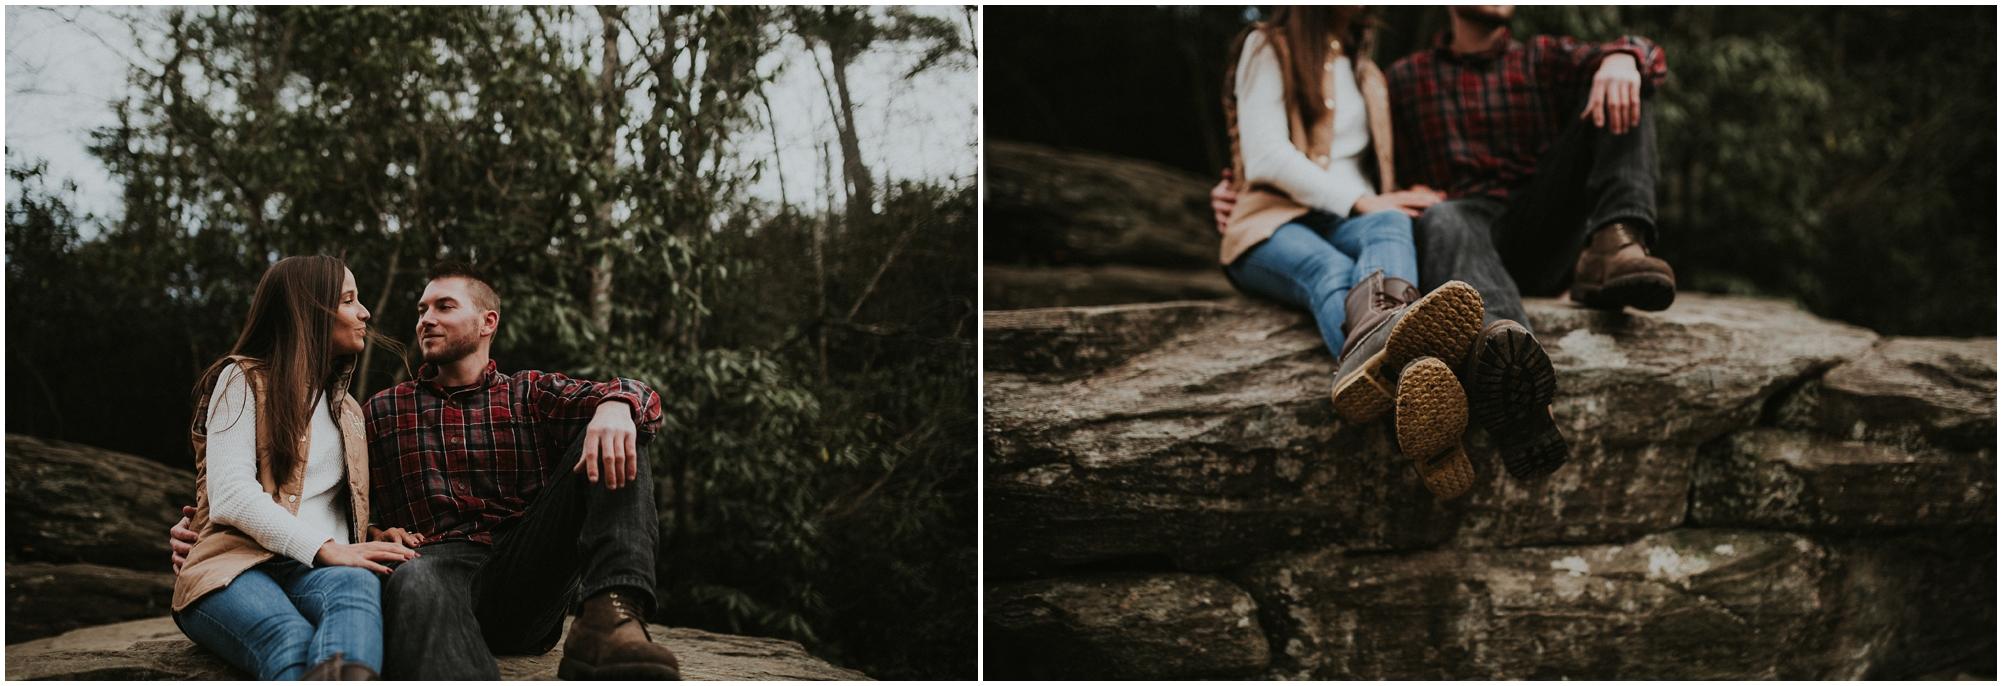 Linville-Falls-Engagement-avonne-Photography-61.jpg